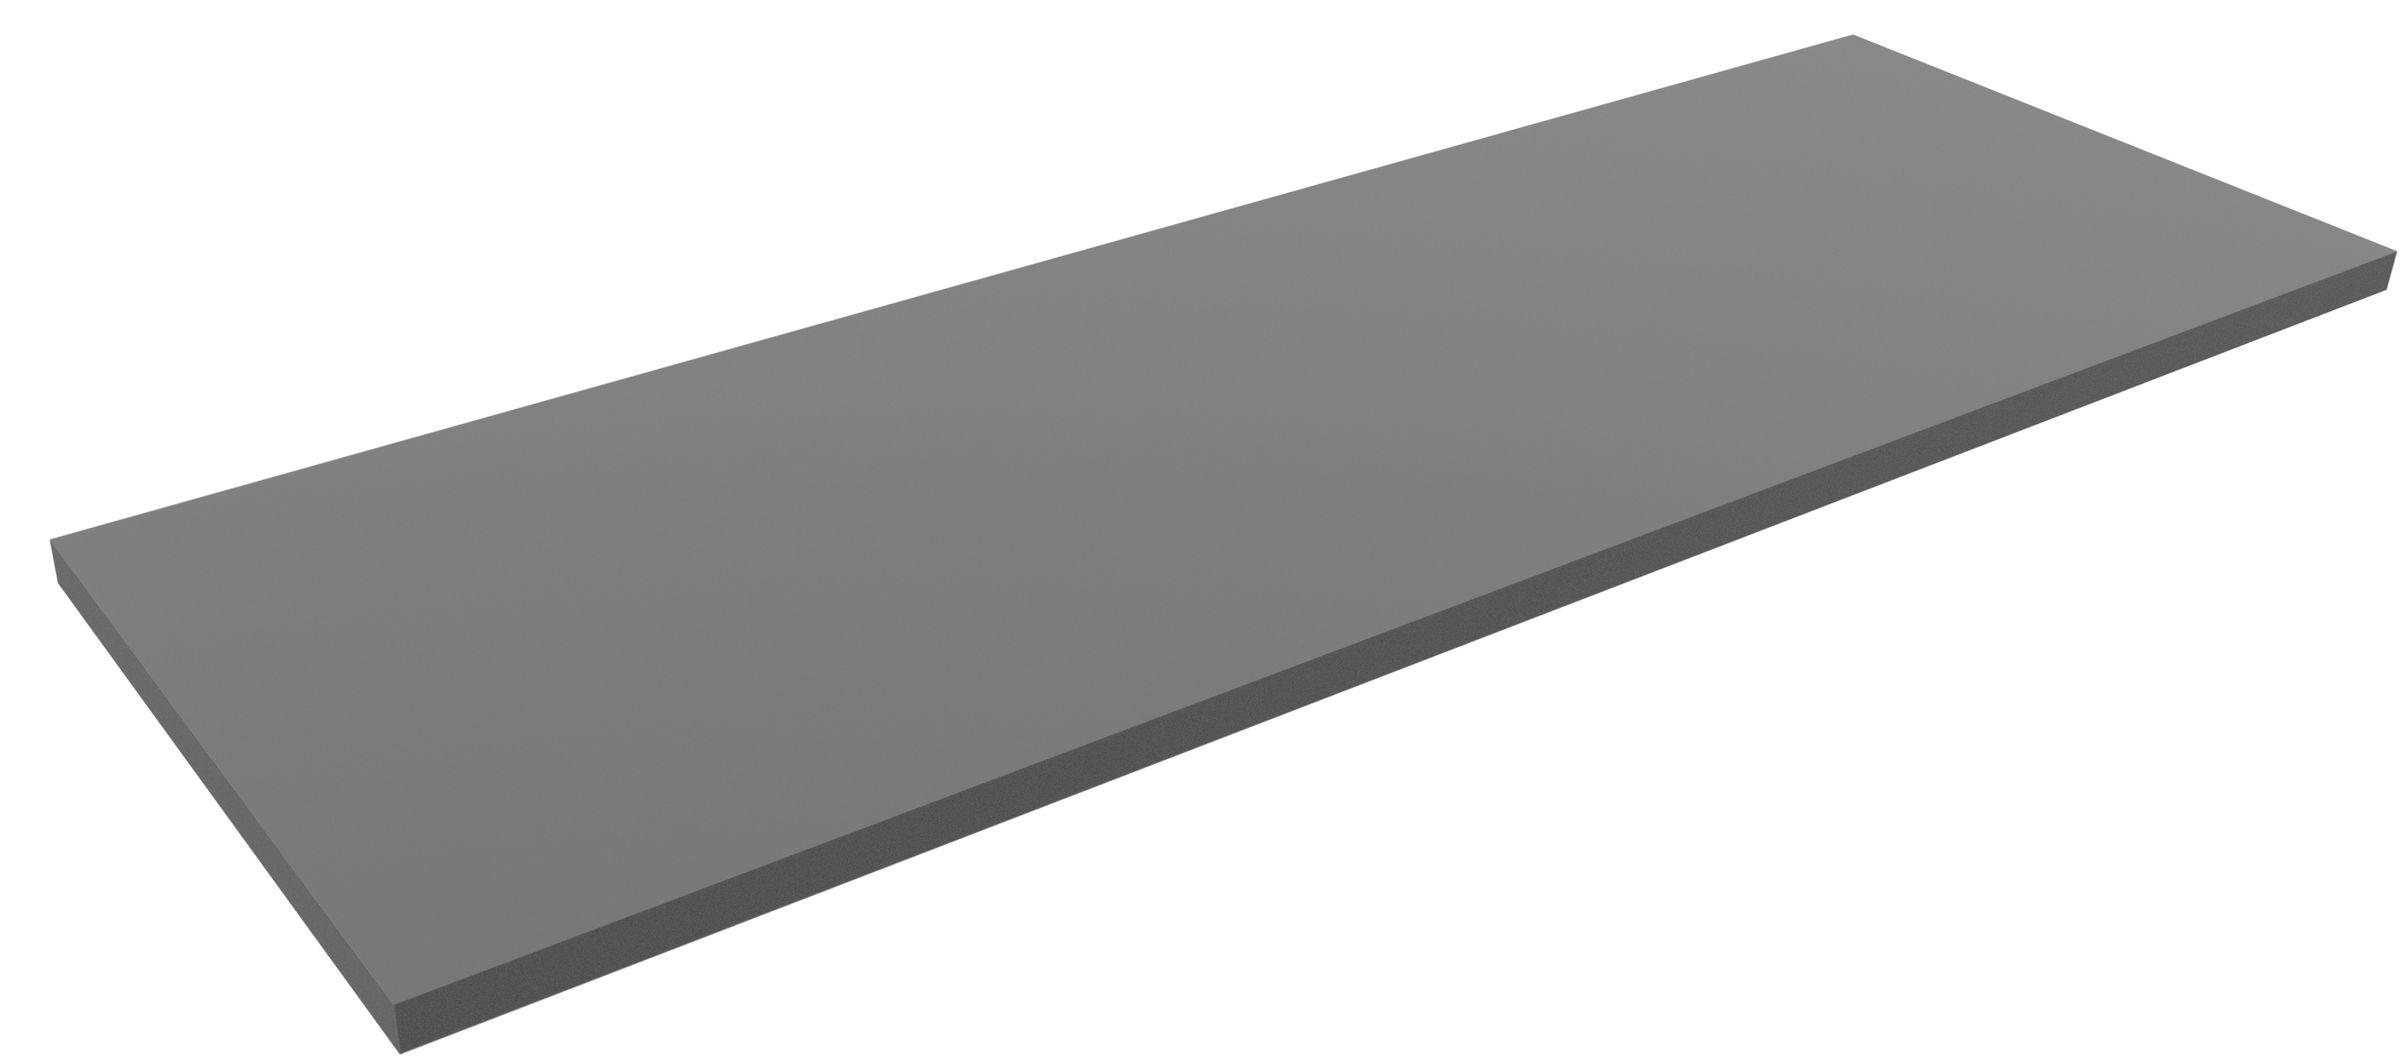 500 Grade 300mm x 300mm x 1 Pezzo 20mm spessa HDPE foglio